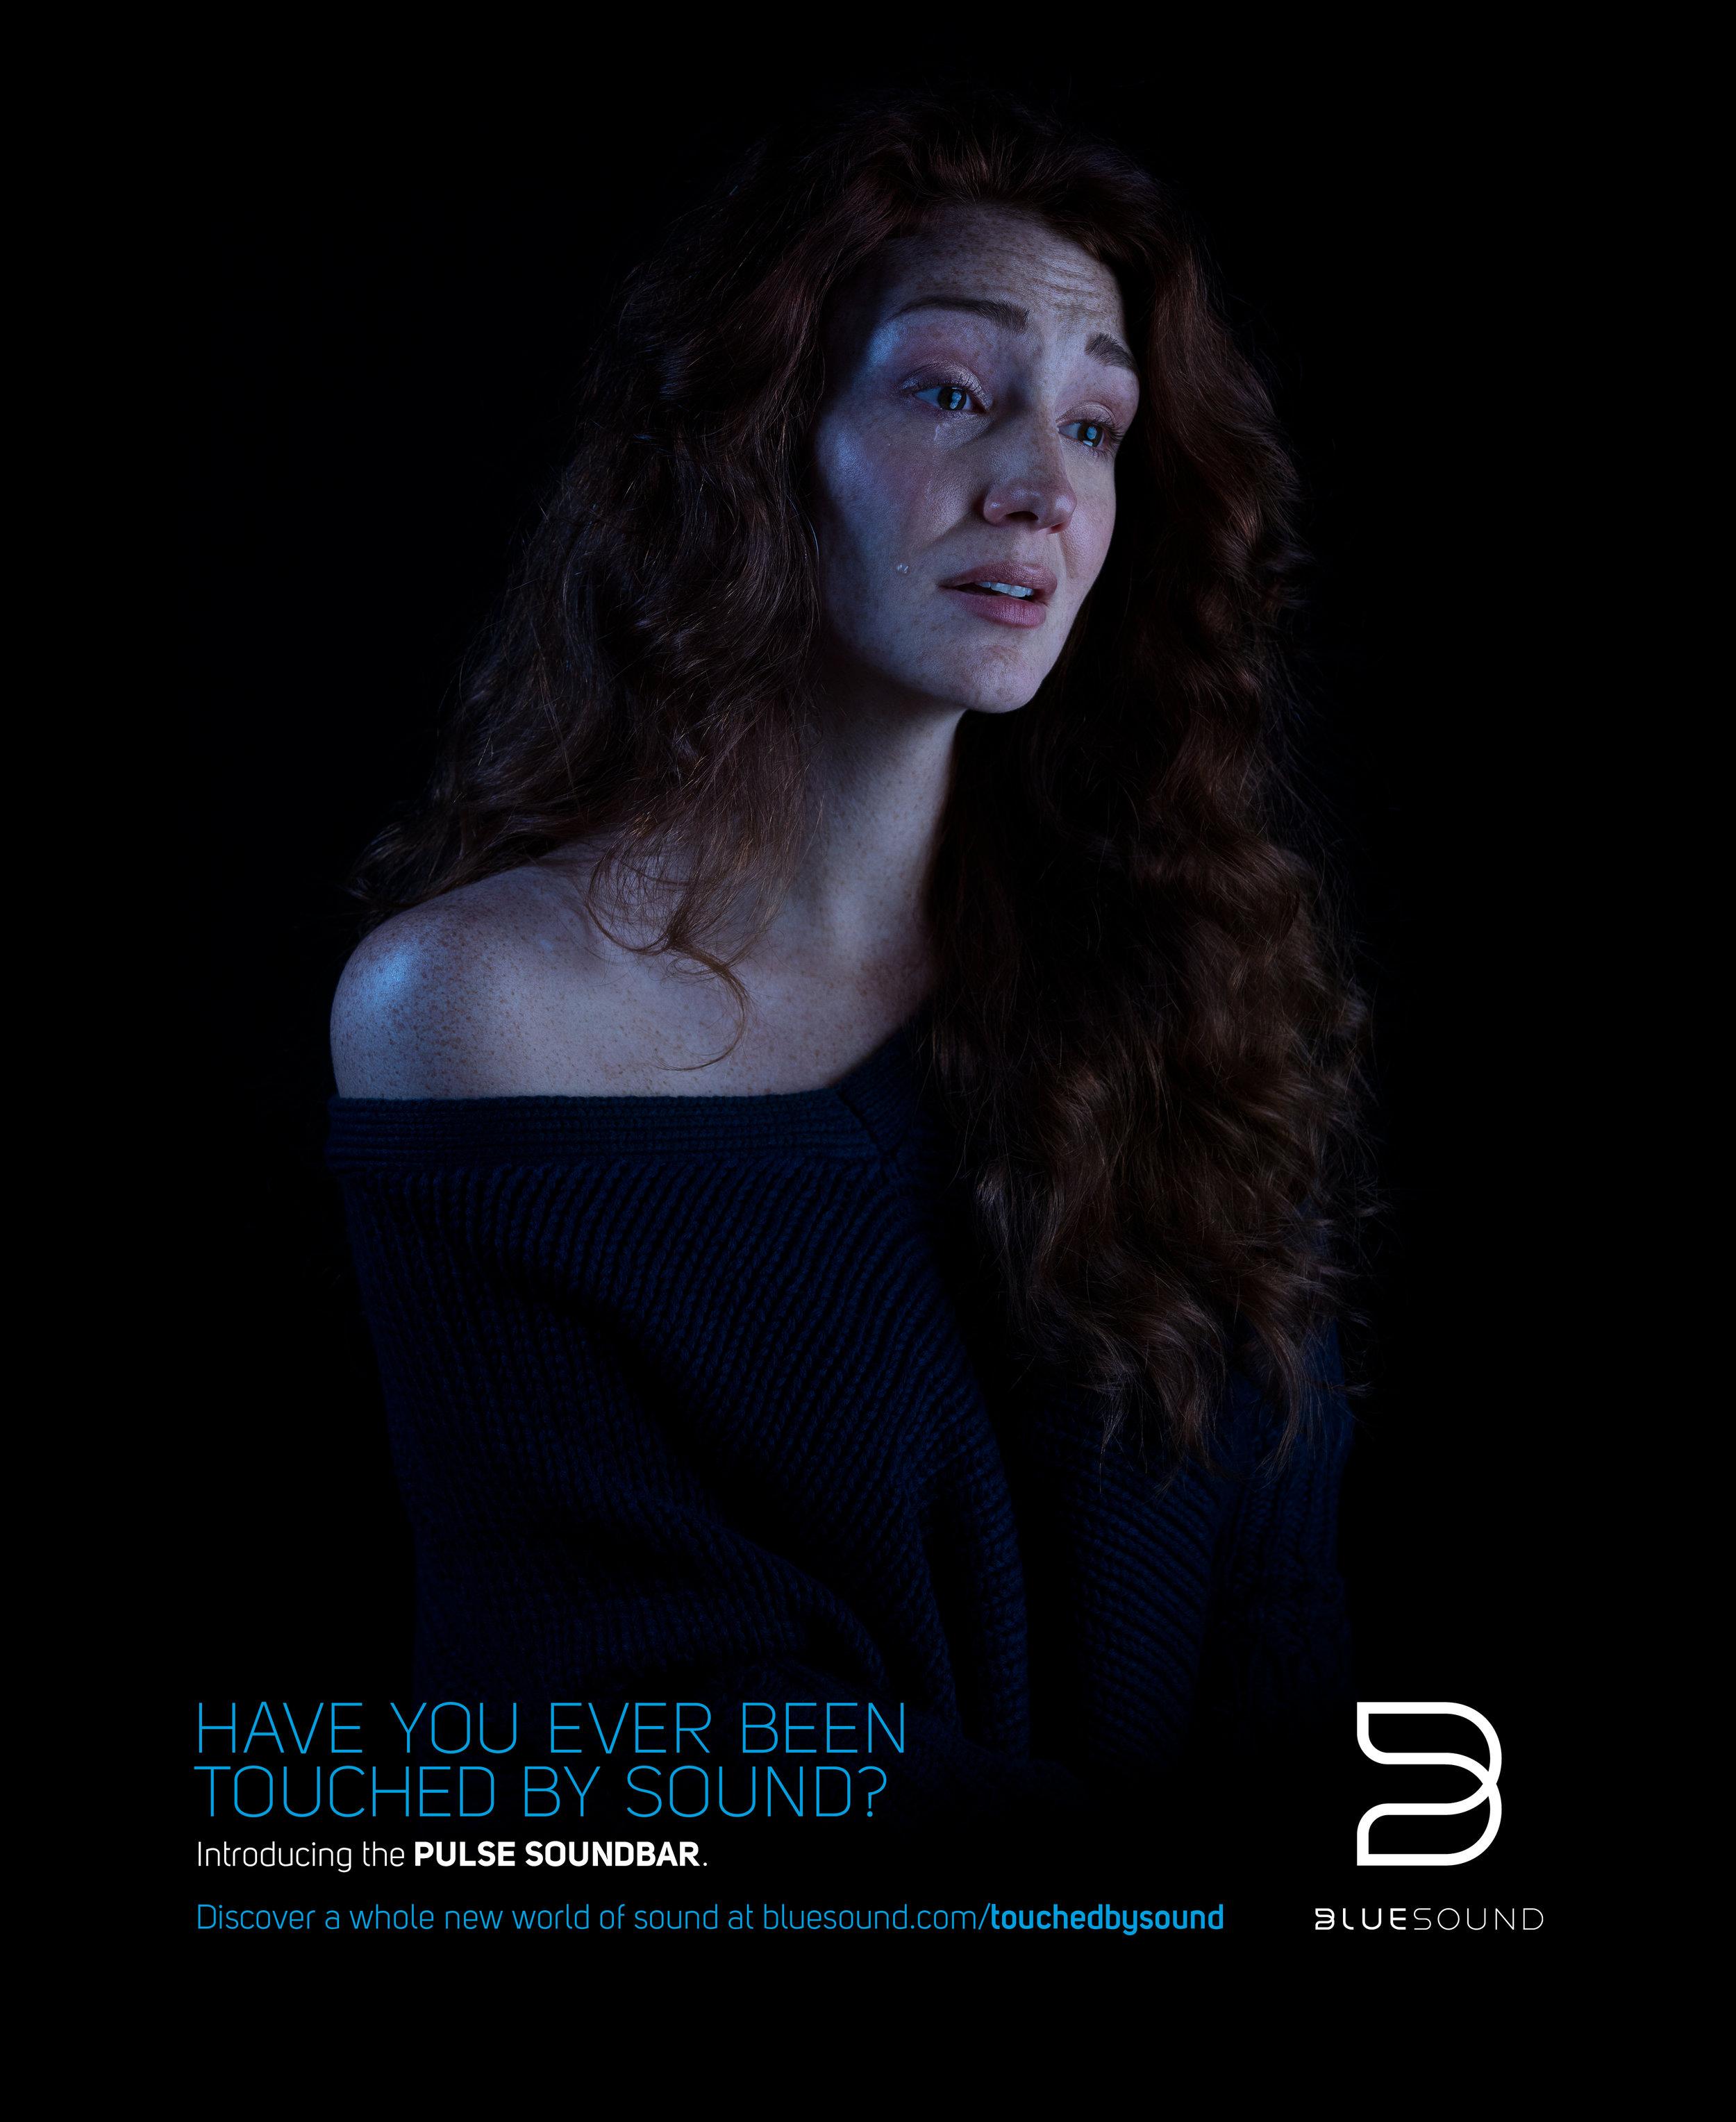 Bluesound_TouchedBySound_Campaign_PRINT_01.jpg